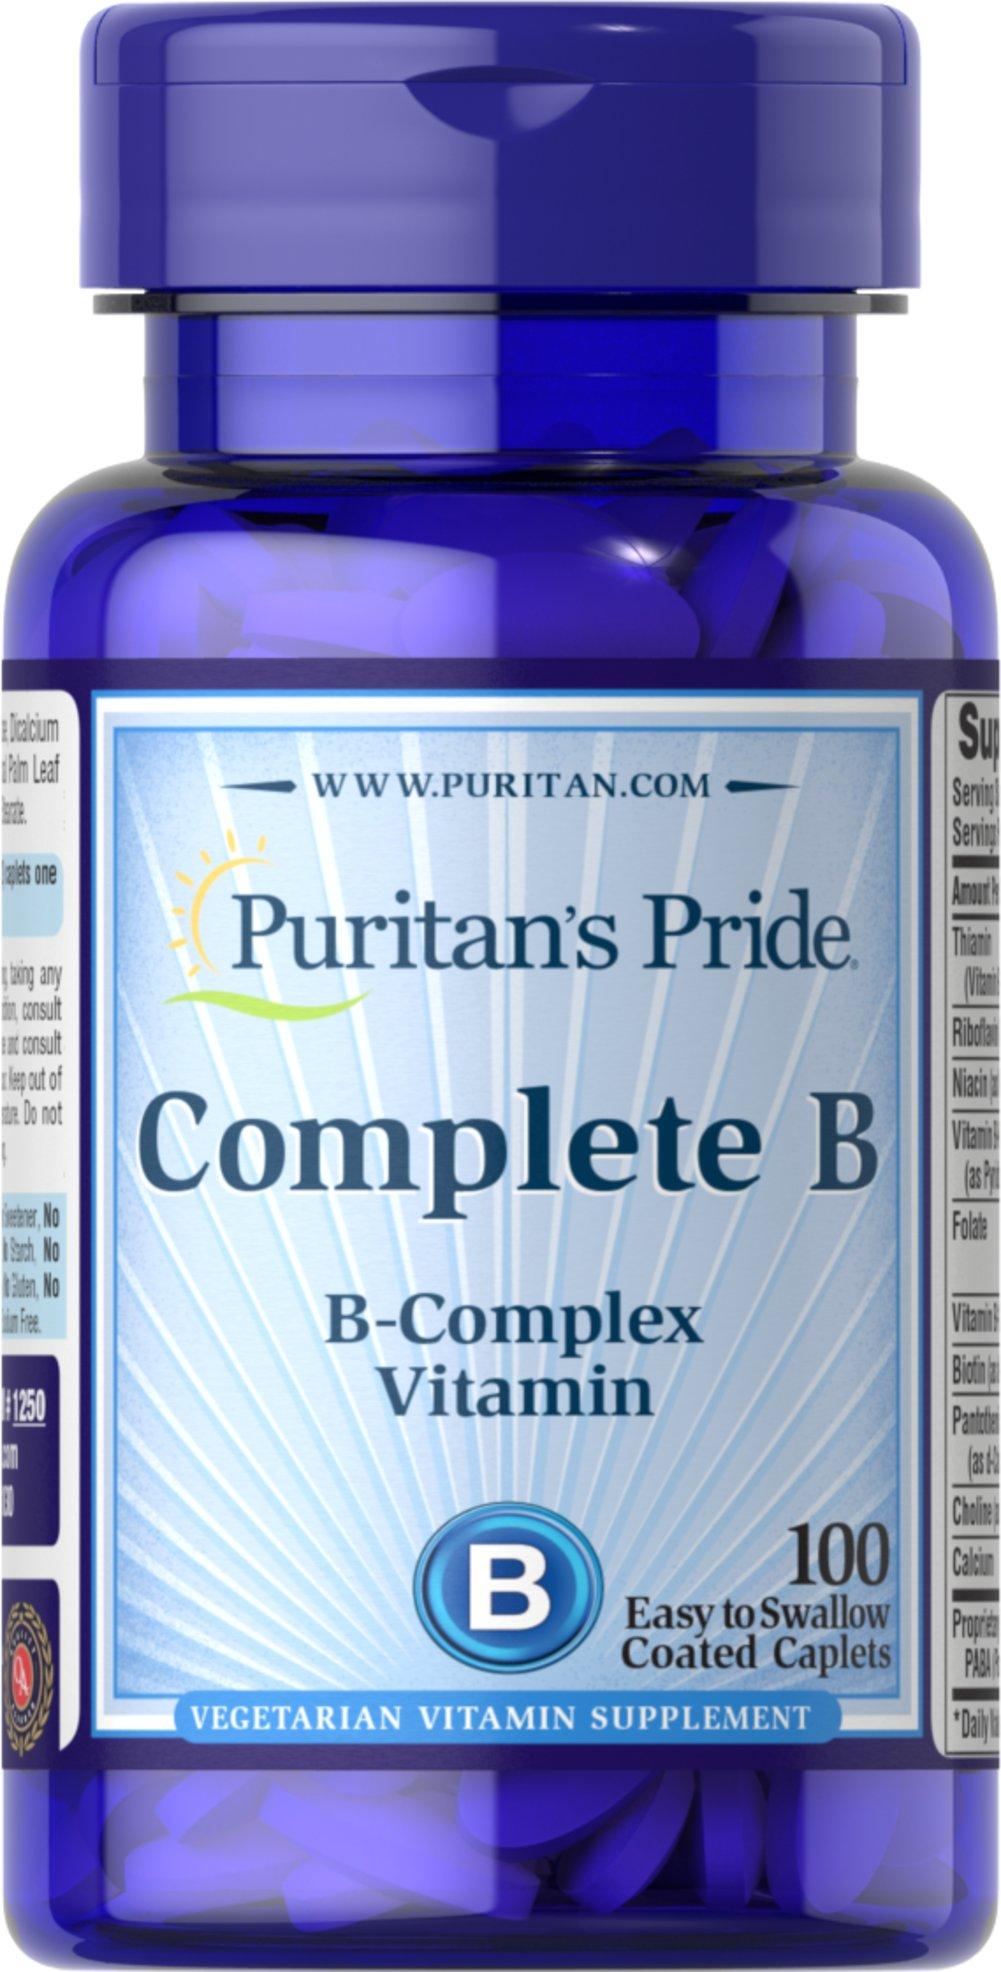 Puritan's Pride Complete B - B Complex Vitamins - Shop Journey